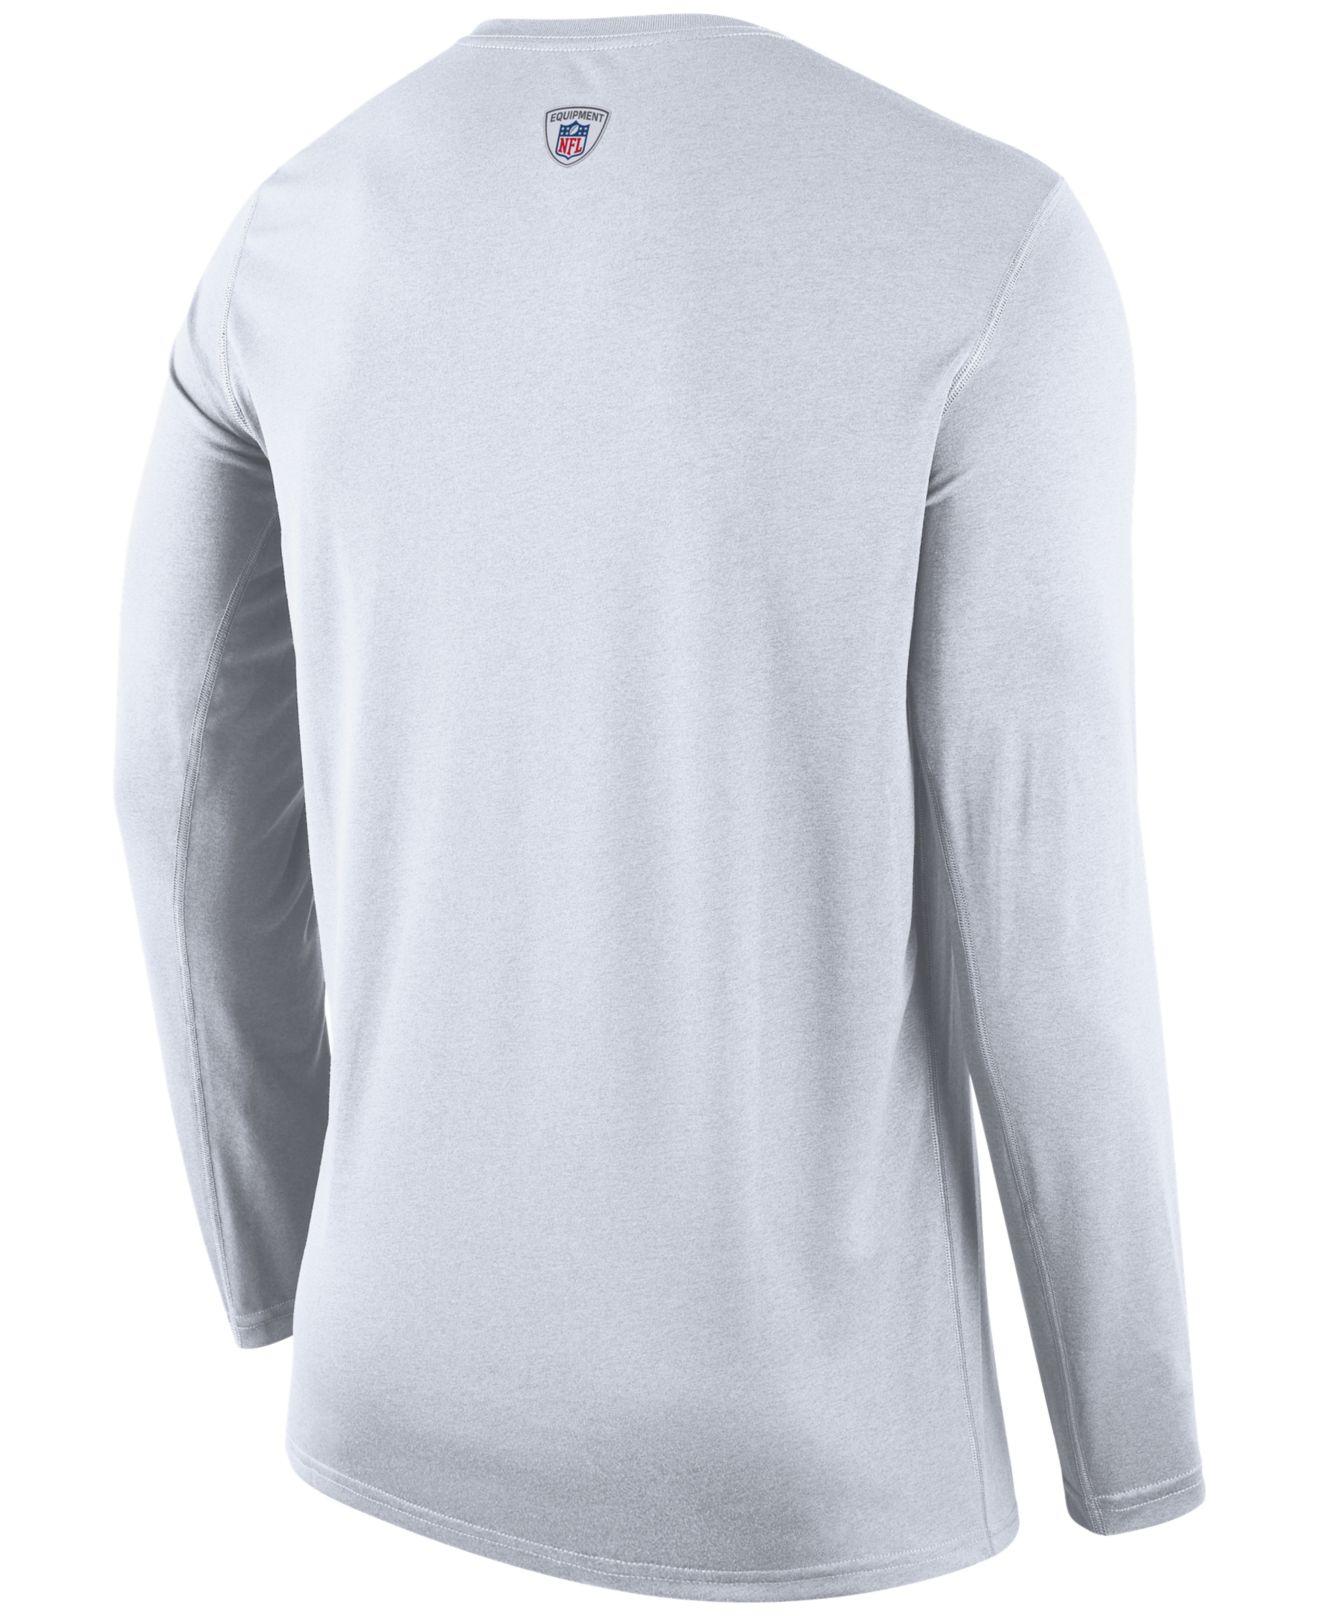 1fea250e0 Green Bay Packers Womens Long Sleeve Shirt